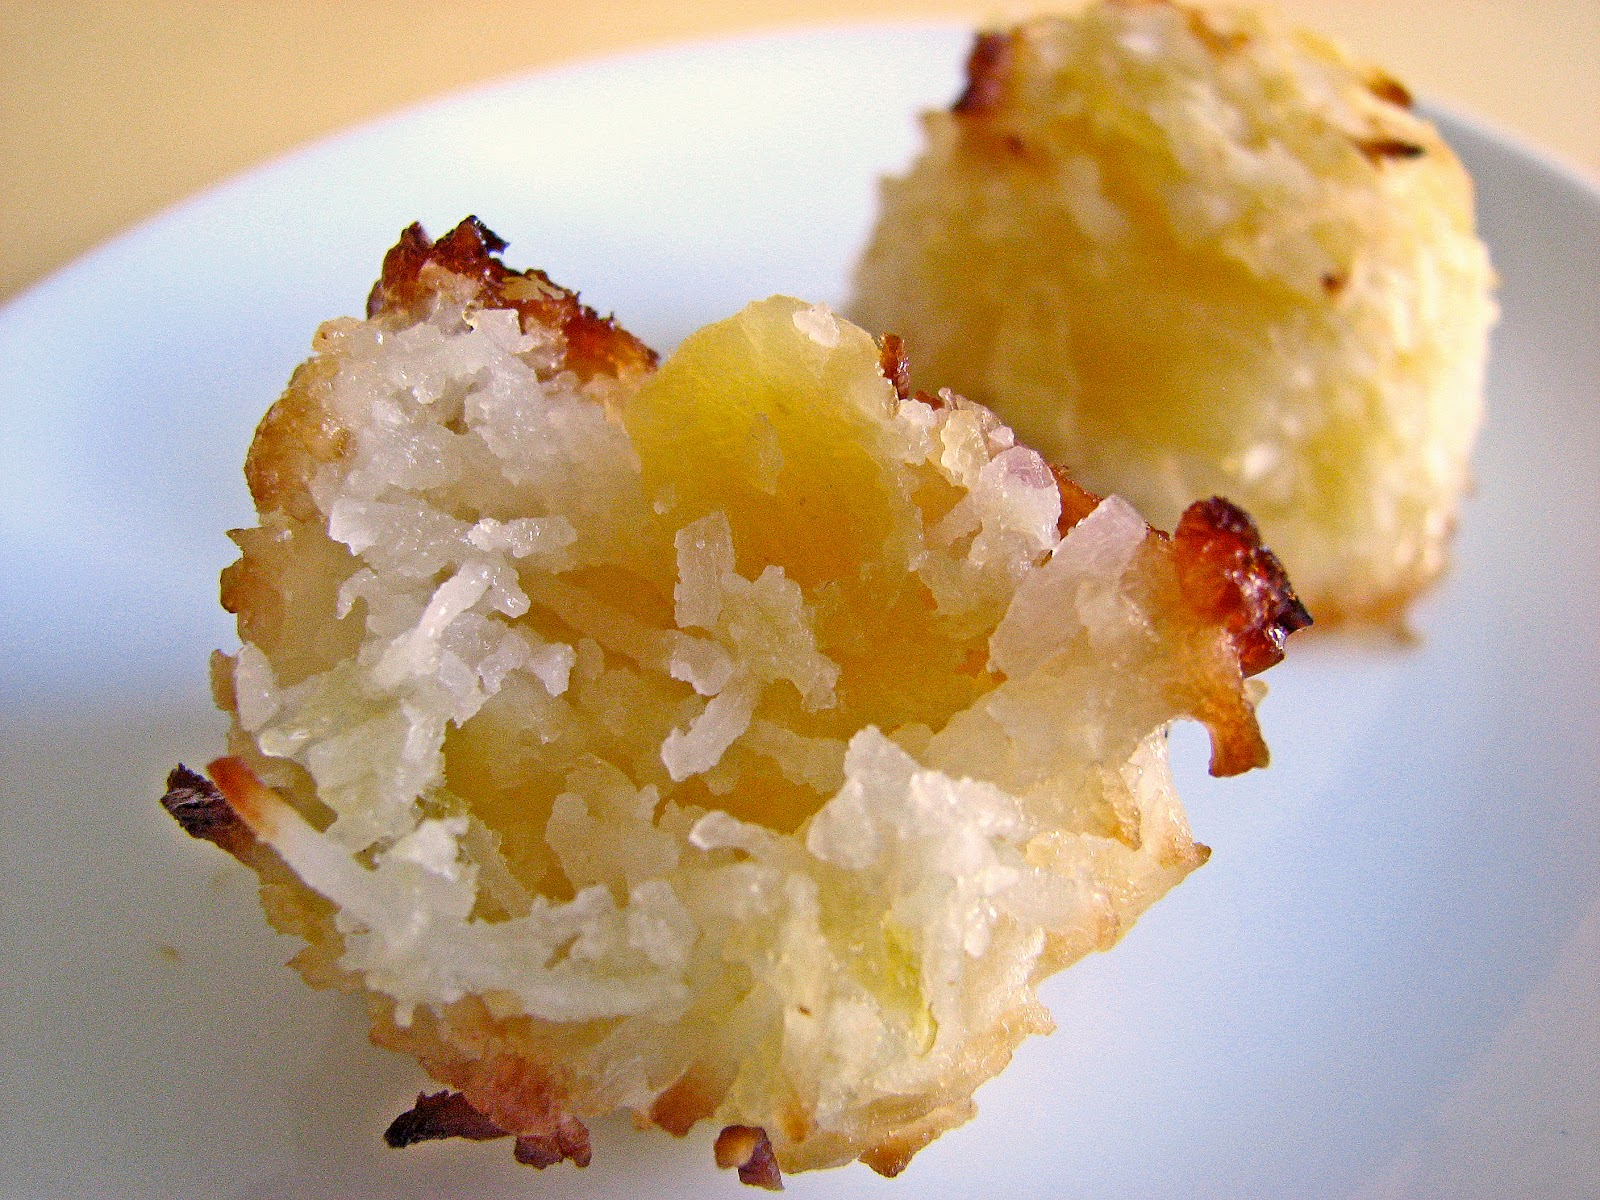 pastry studio: Pineapple Coconut Macaroons